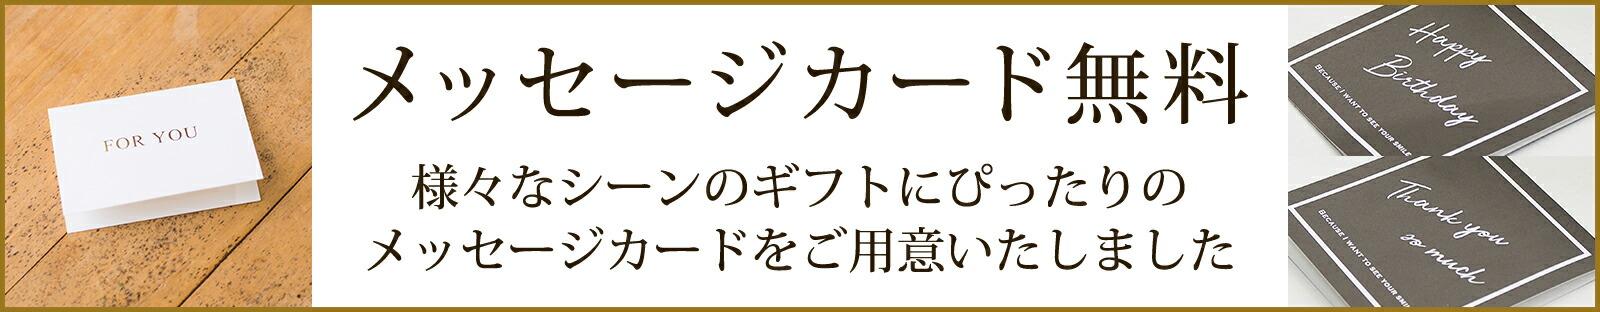 message_card_bnr3